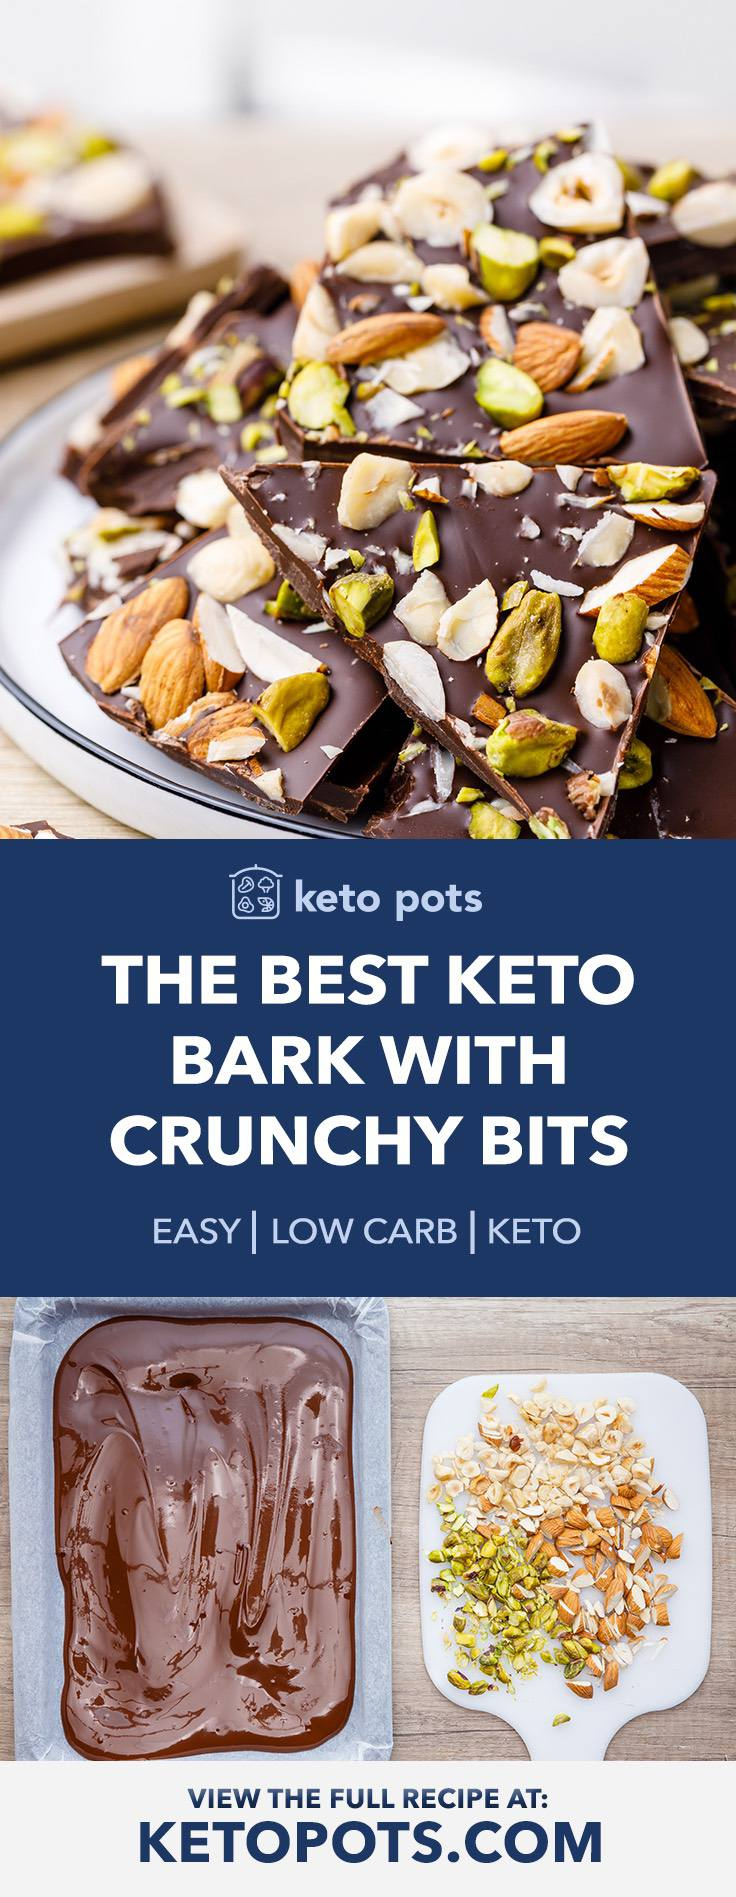 Sugar-Free Keto Bark with Crunchy Bits